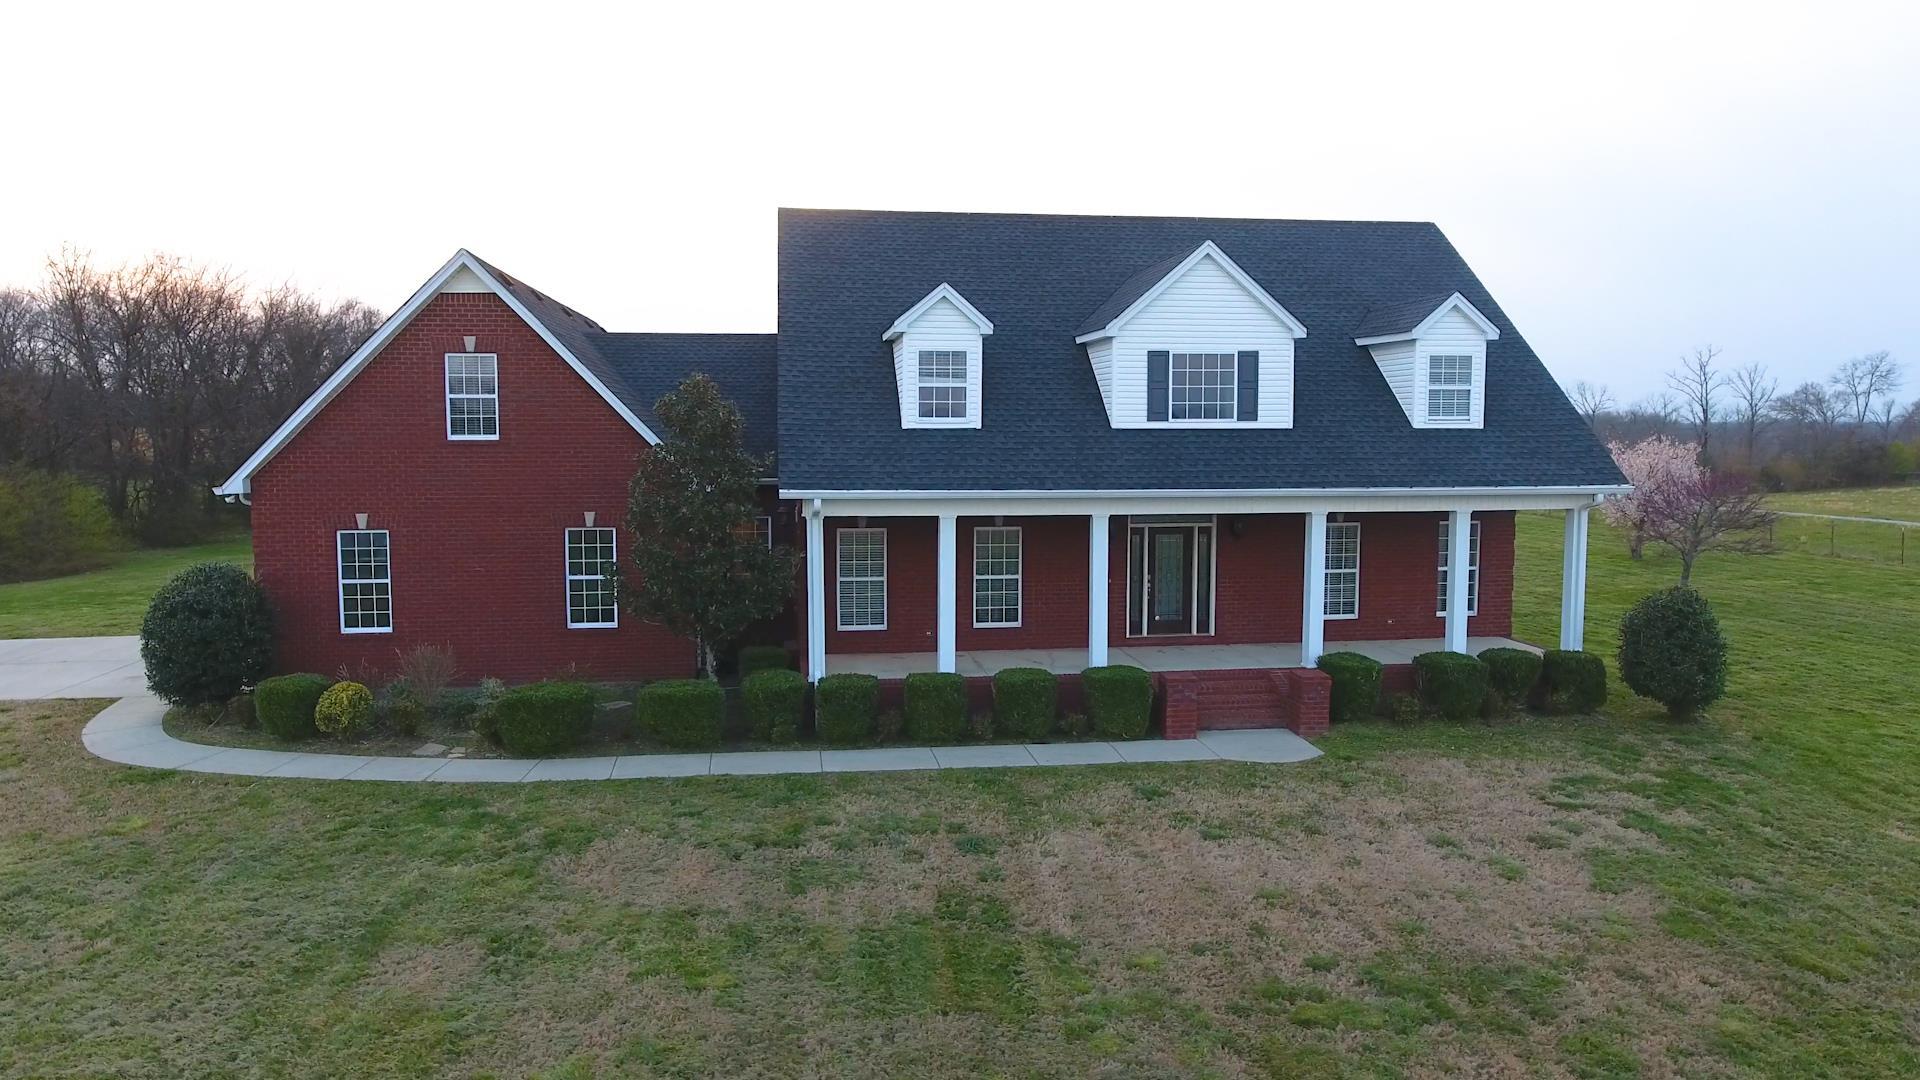 297 Old Nashville Dirt Rd, Shelbyville, TN 37160 - Shelbyville, TN real estate listing